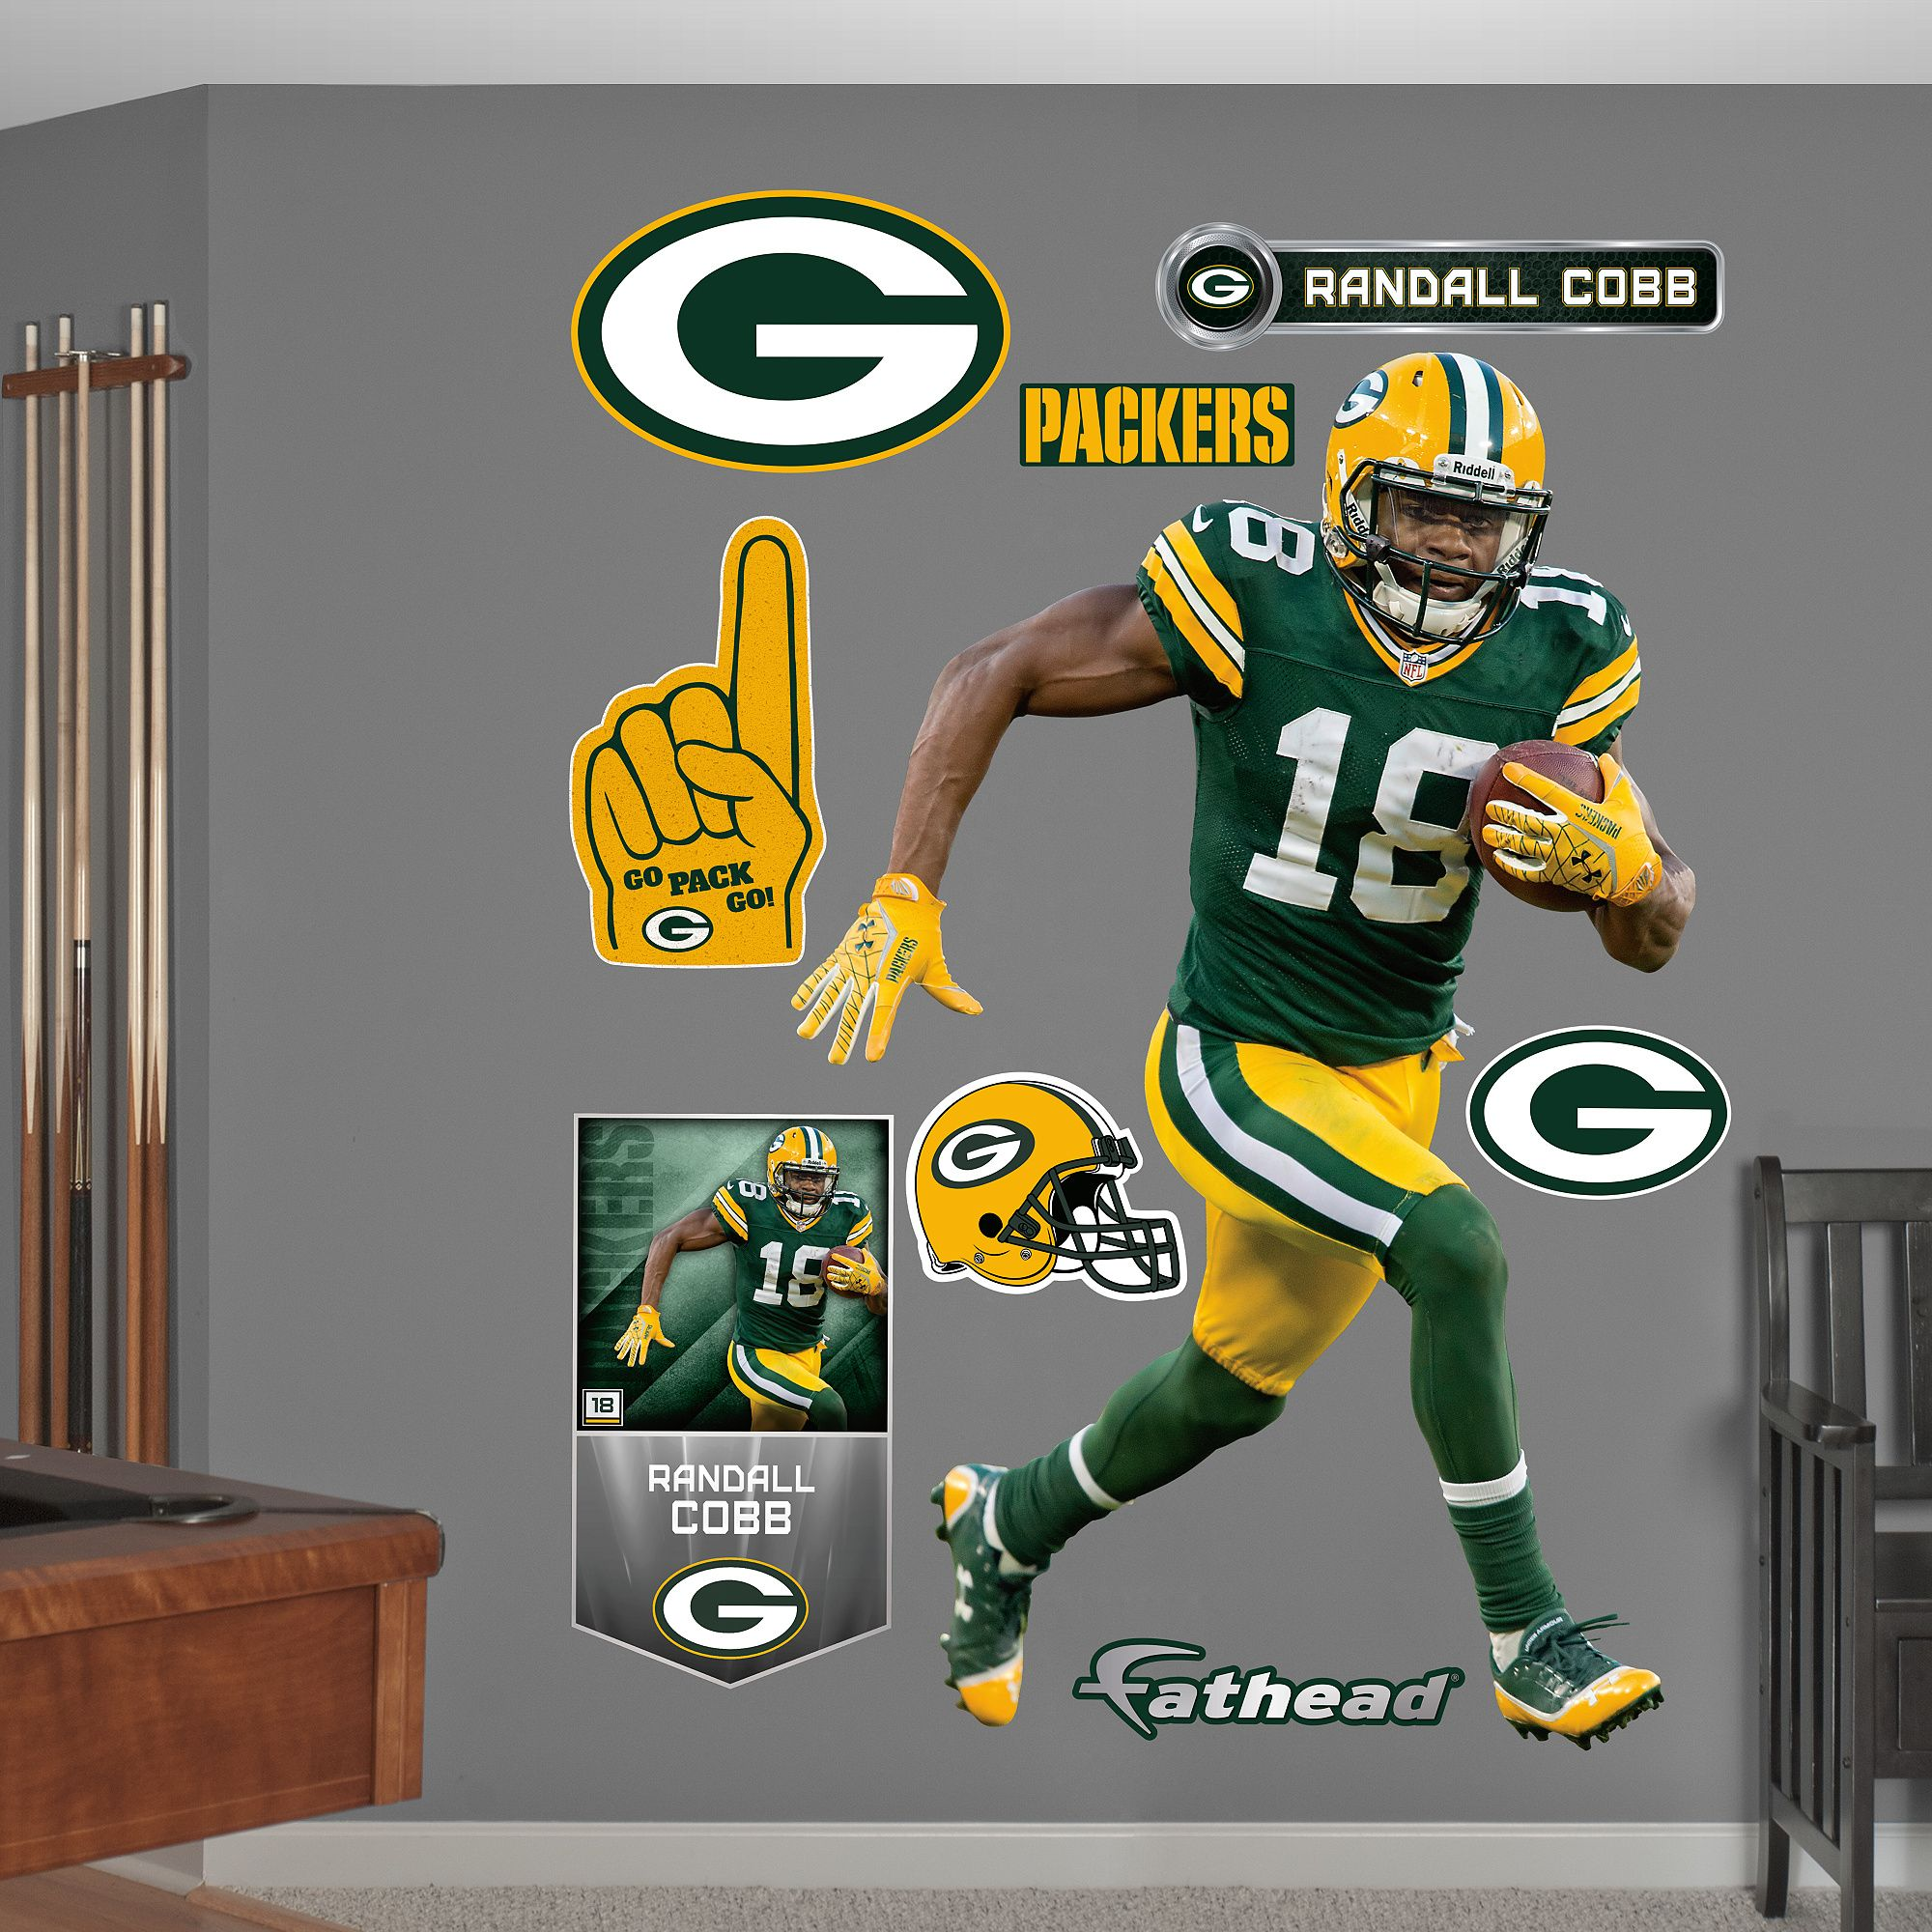 huge selection of a805a 432e7 Randall Cobb - No. 18, Green Bay Packers | fat head ...